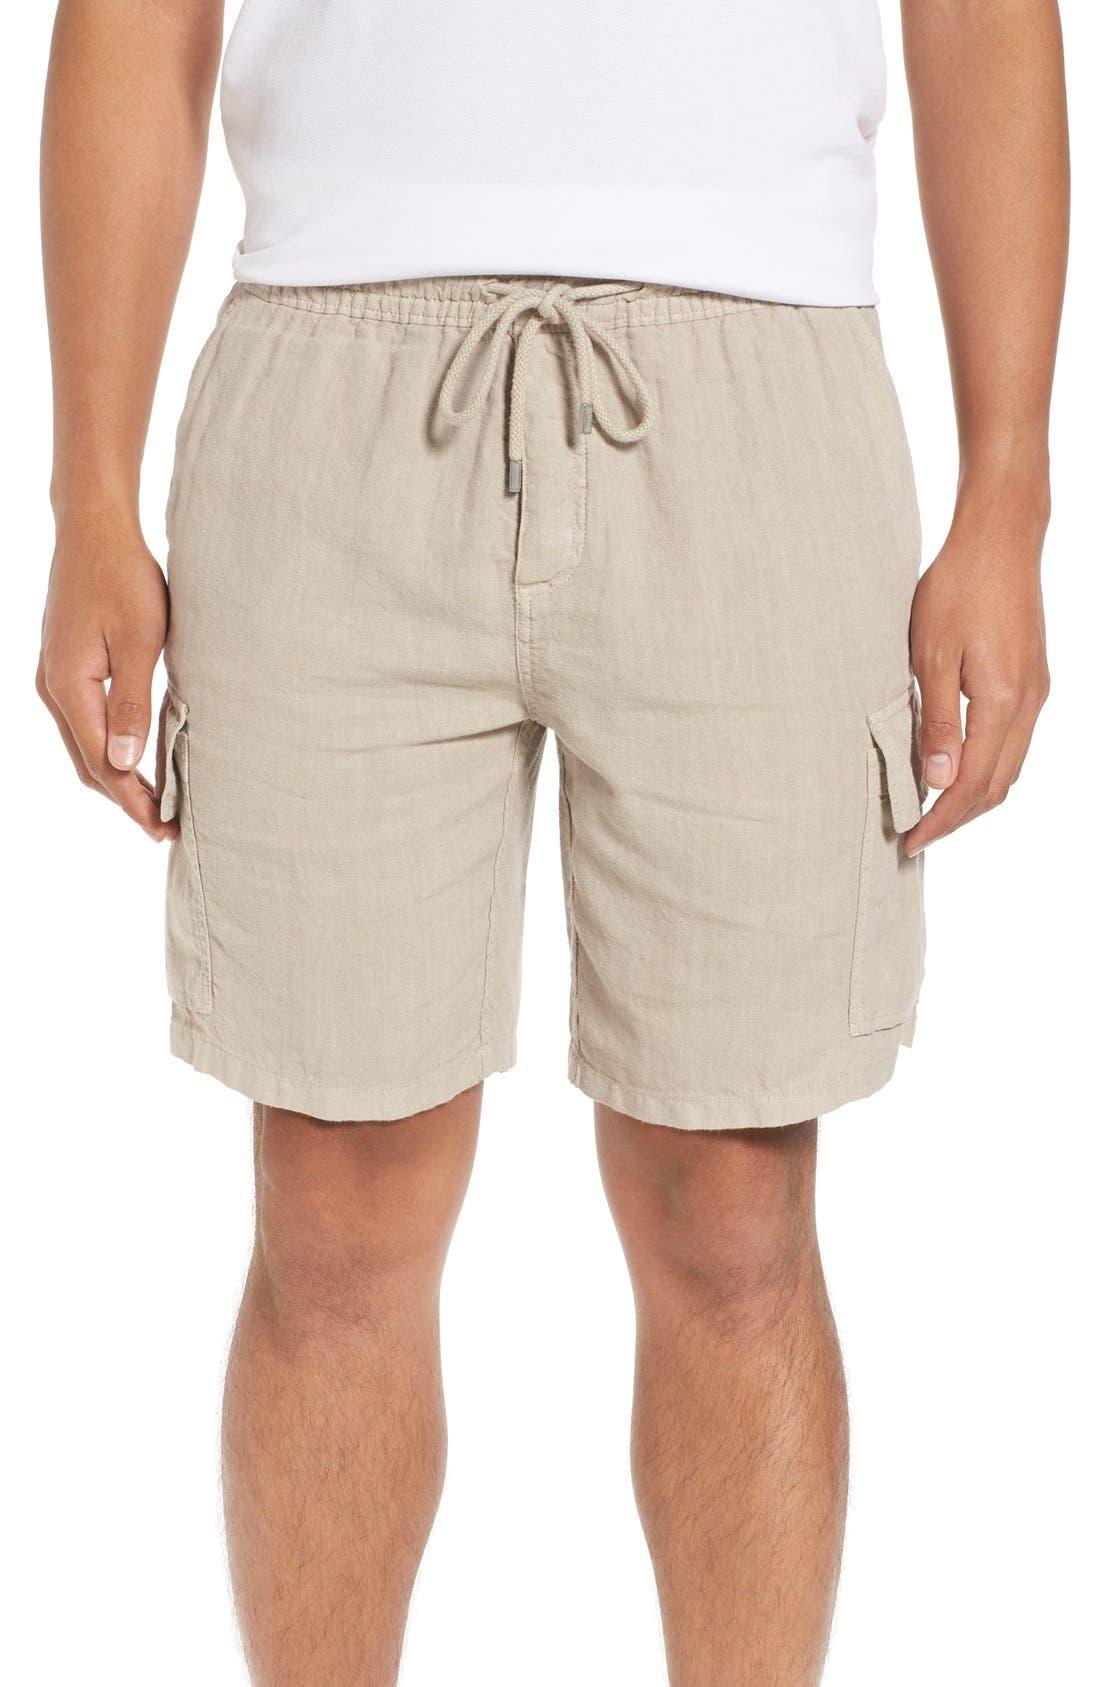 Vilbrequin Linen Cargo Shorts,                             Main thumbnail 1, color,                             Jute